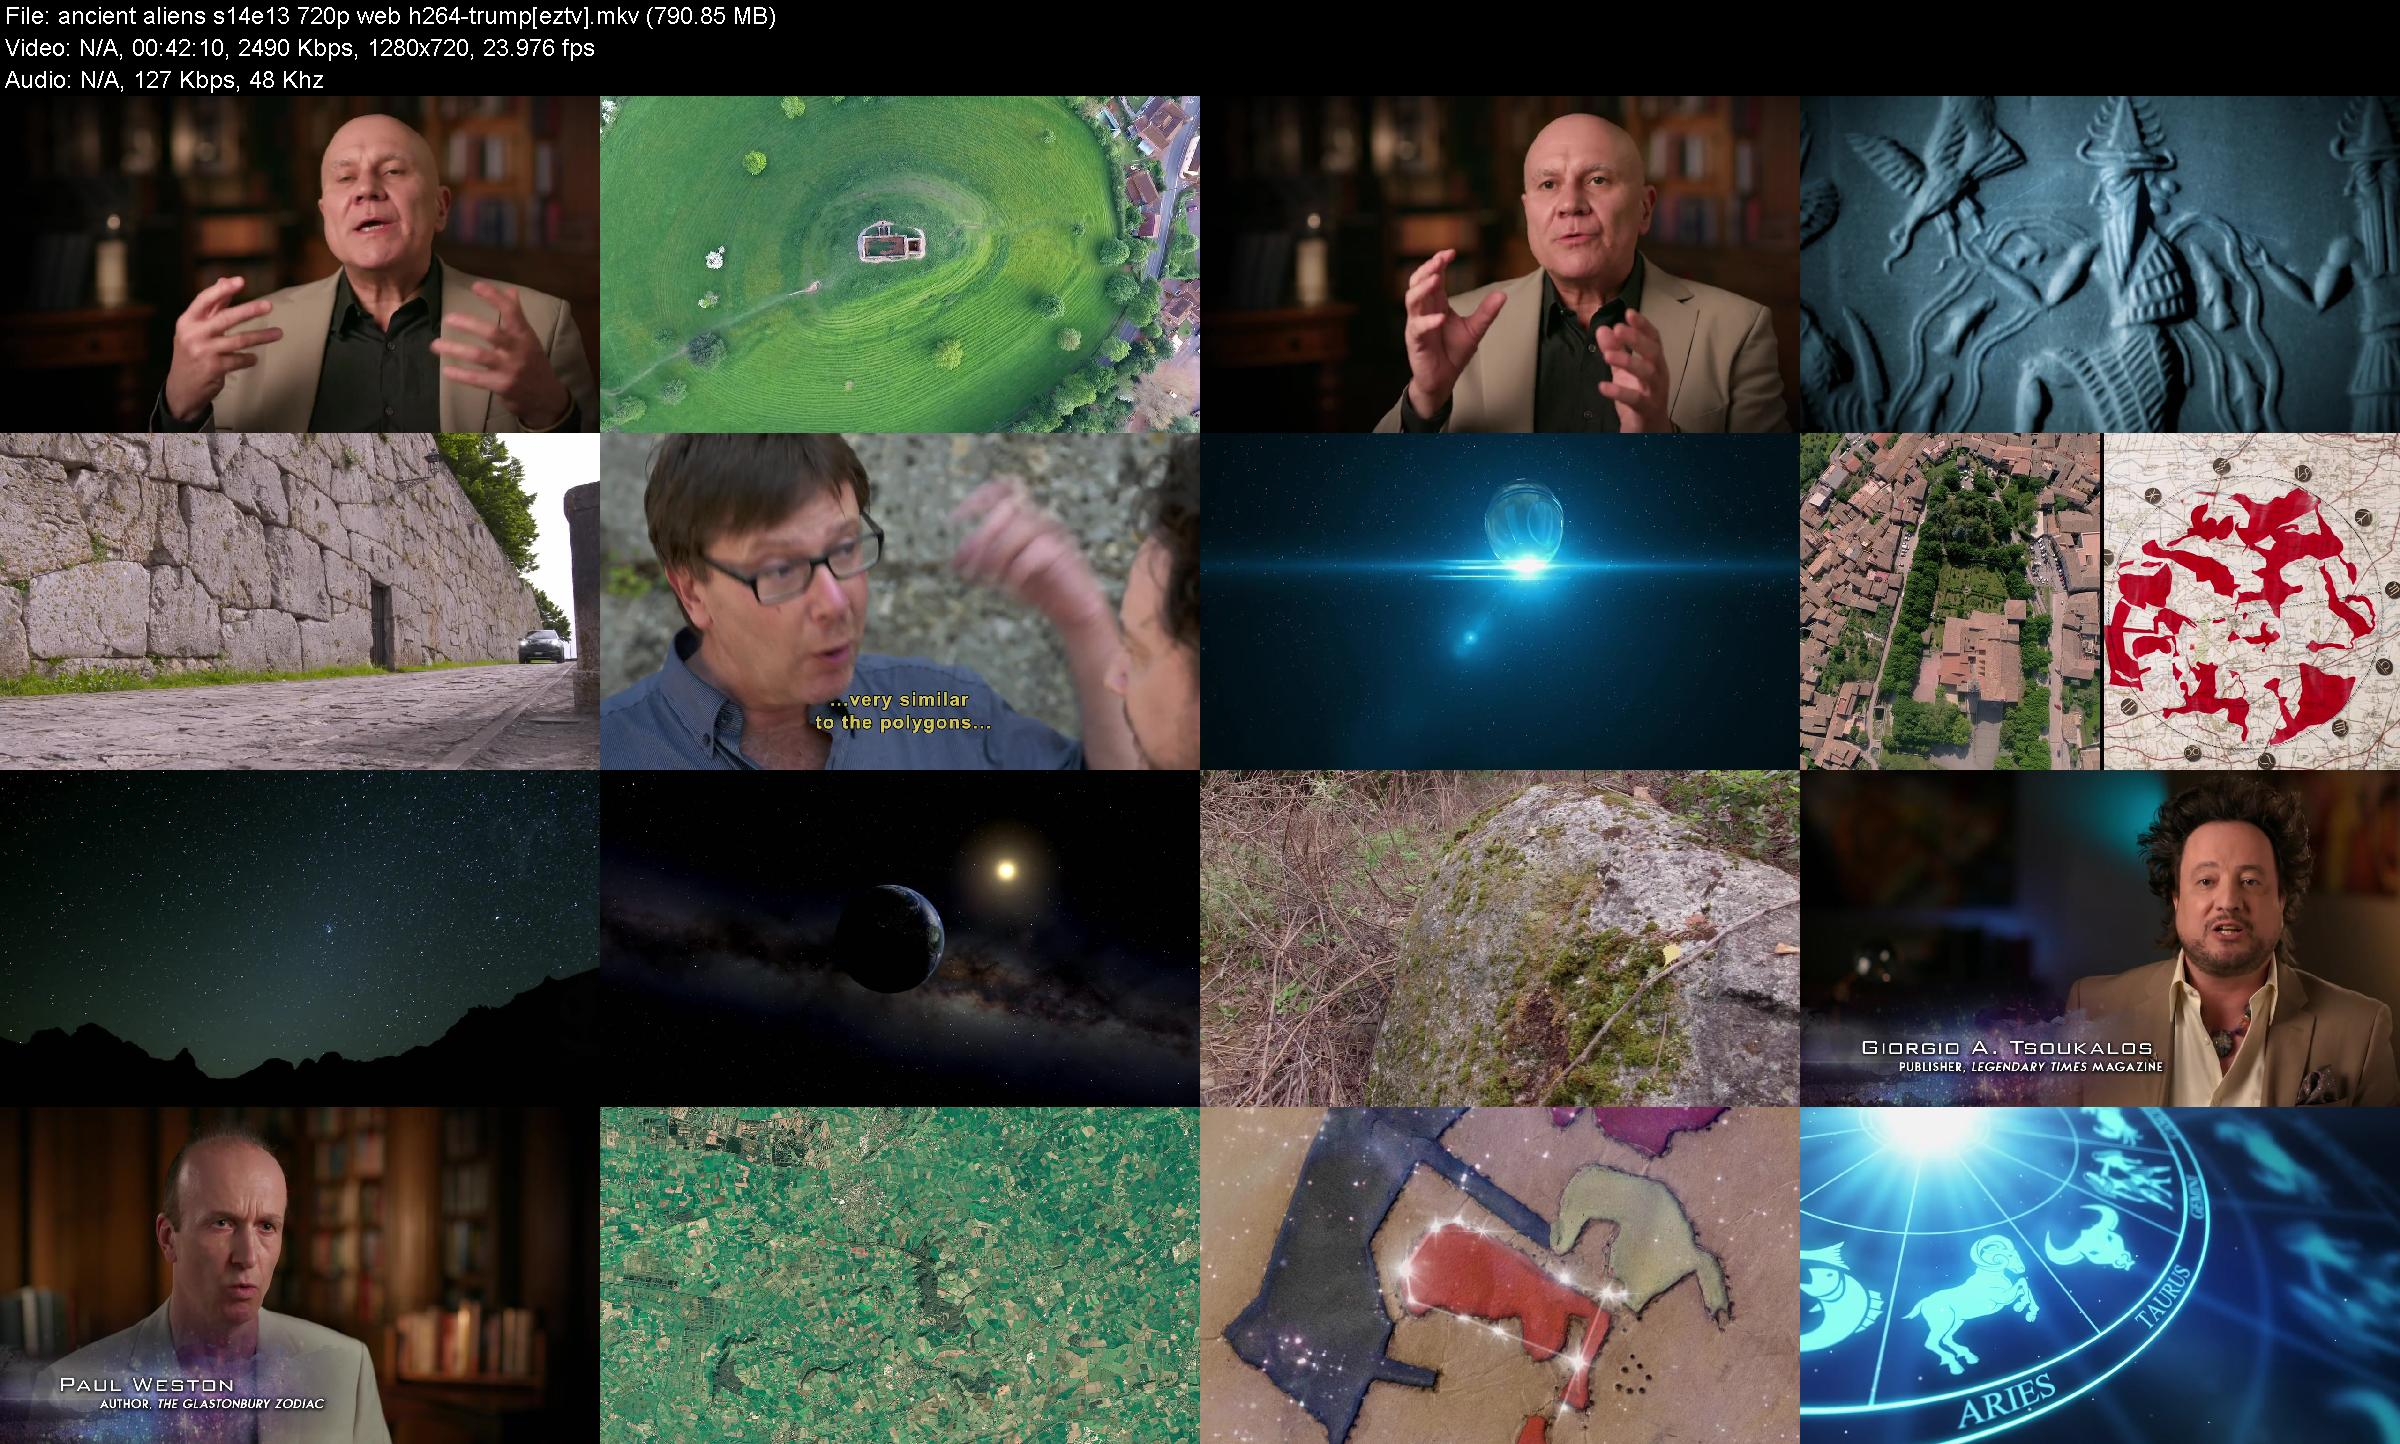 ancient aliens s14e13 720p web h264-trump